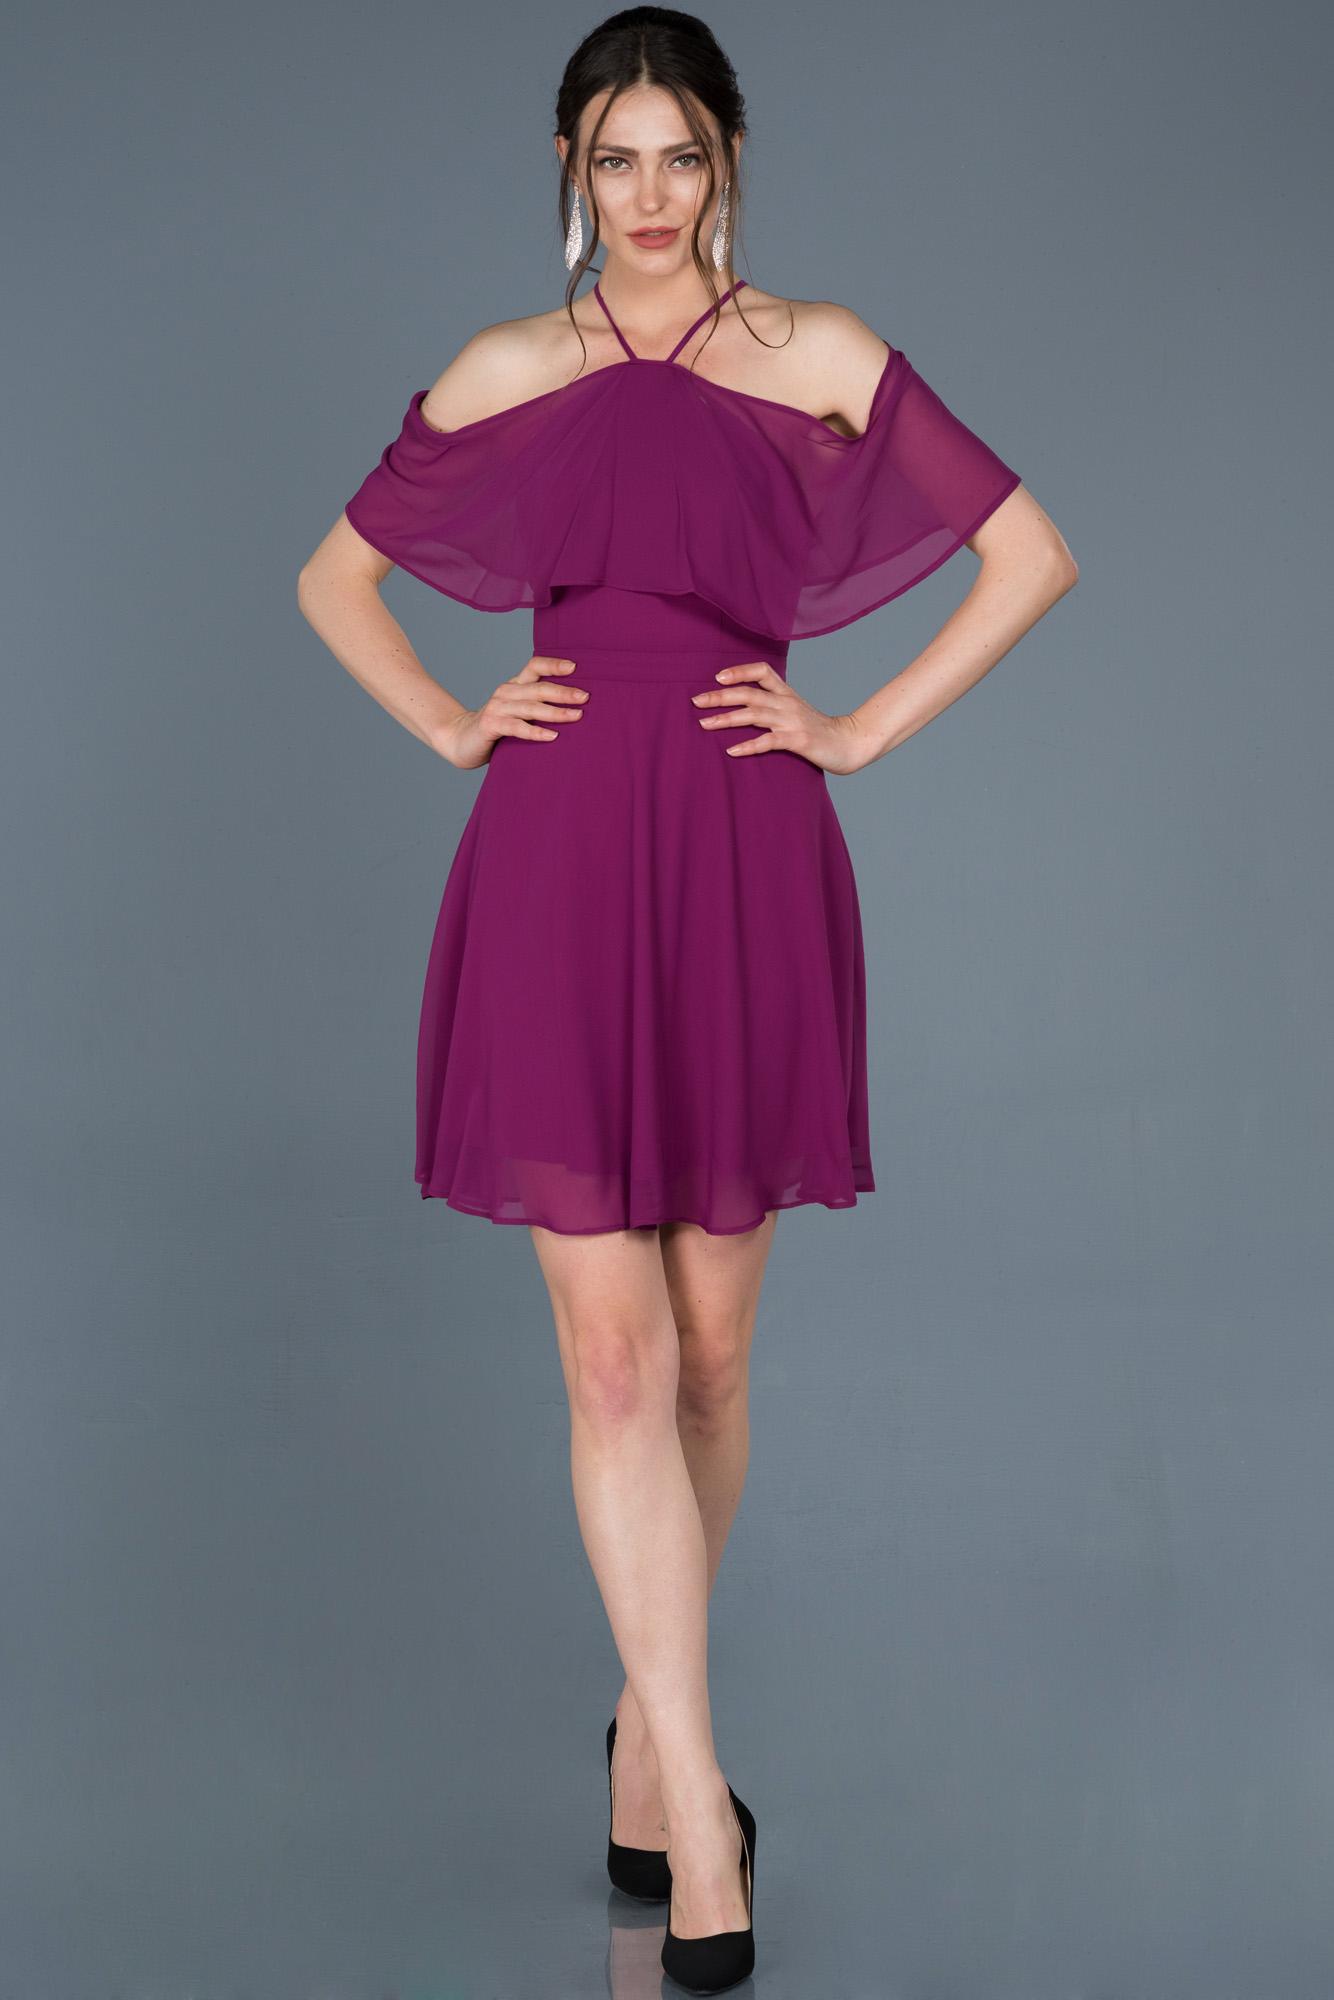 Violet Kısa Şifon Davet Elbisesi